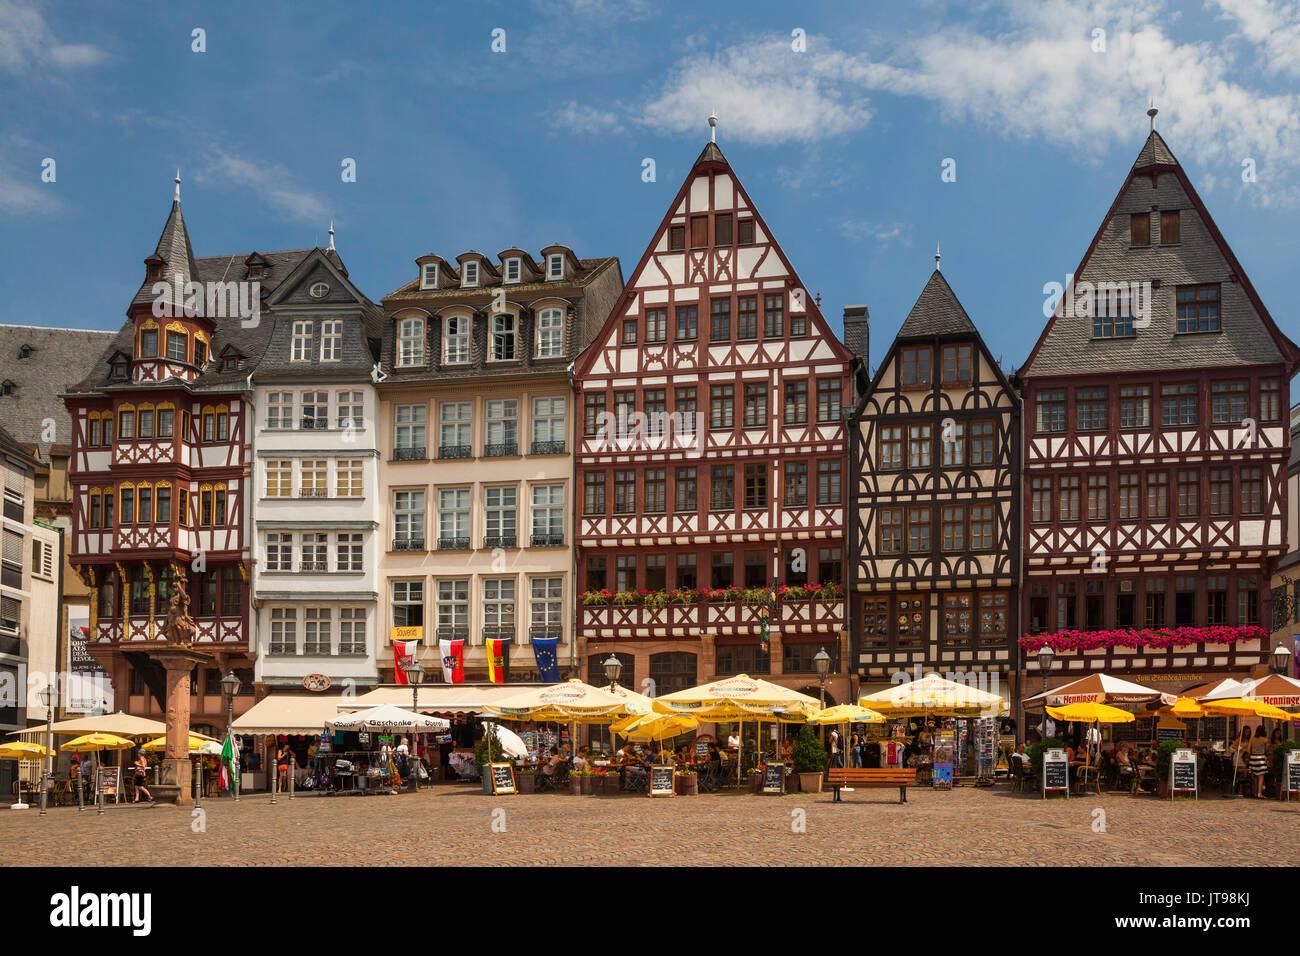 Romerberg, Altstadt, Frankurt Germany - Stock Image